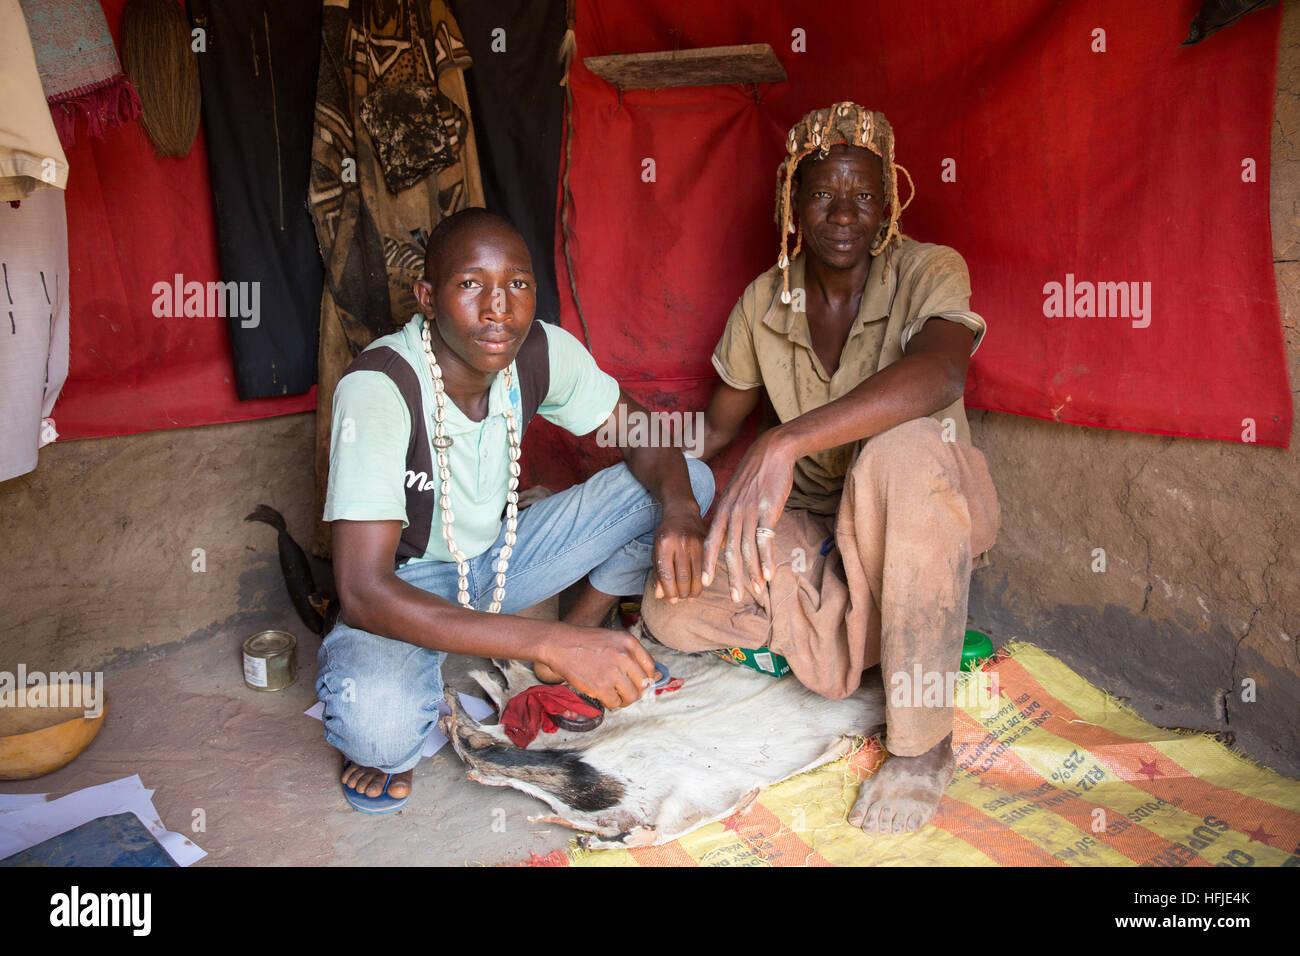 Baro village, Guinea, 1st May 2015: Layeba Kourouma, 42, farmer and traditional healer with his apprentice. He treats - Stock Image